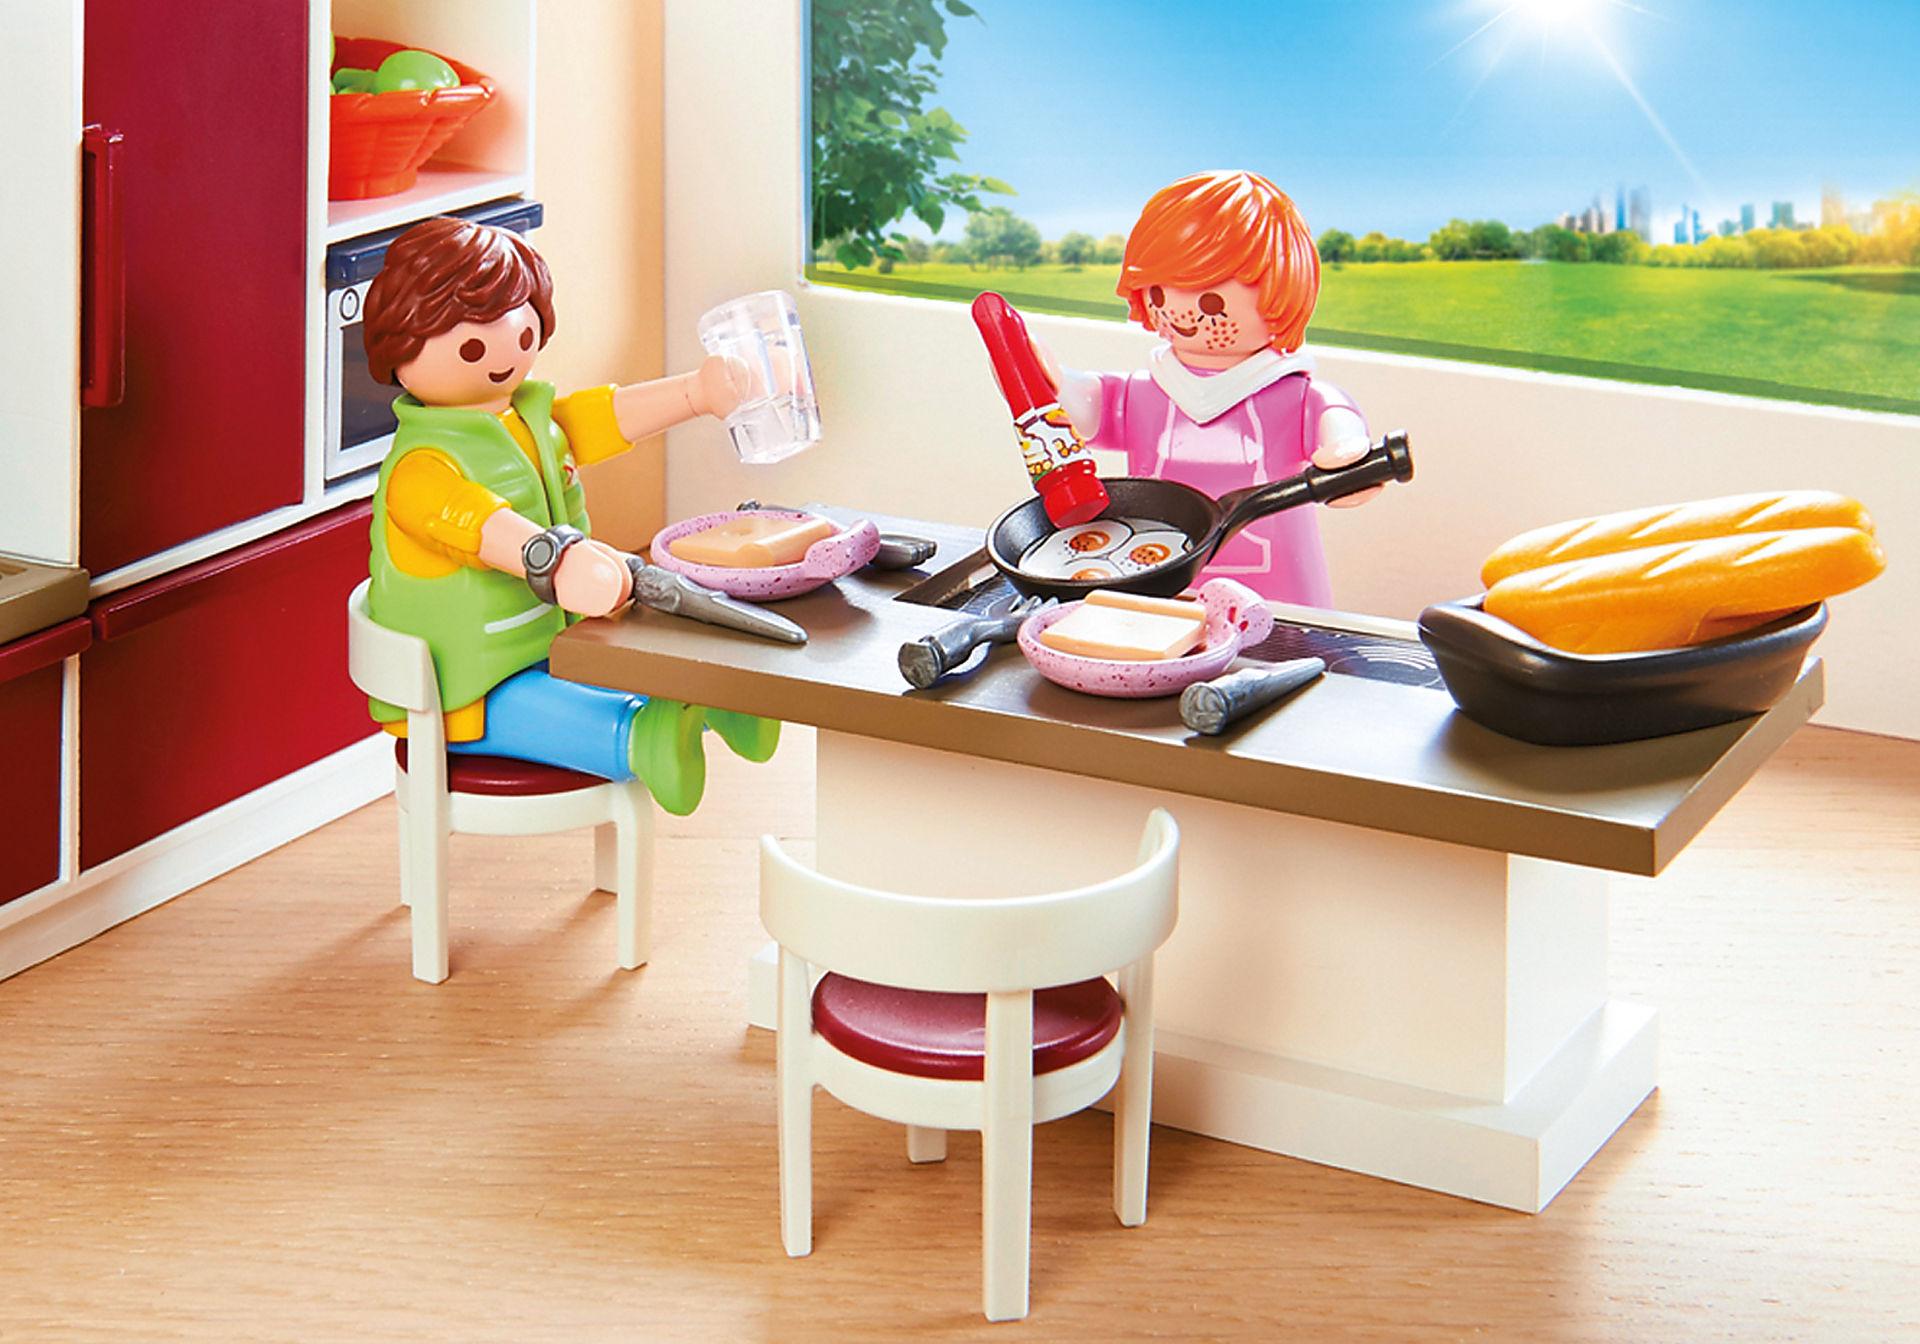 http://media.playmobil.com/i/playmobil/9269_product_extra1/Duża rodzinna kuchnia